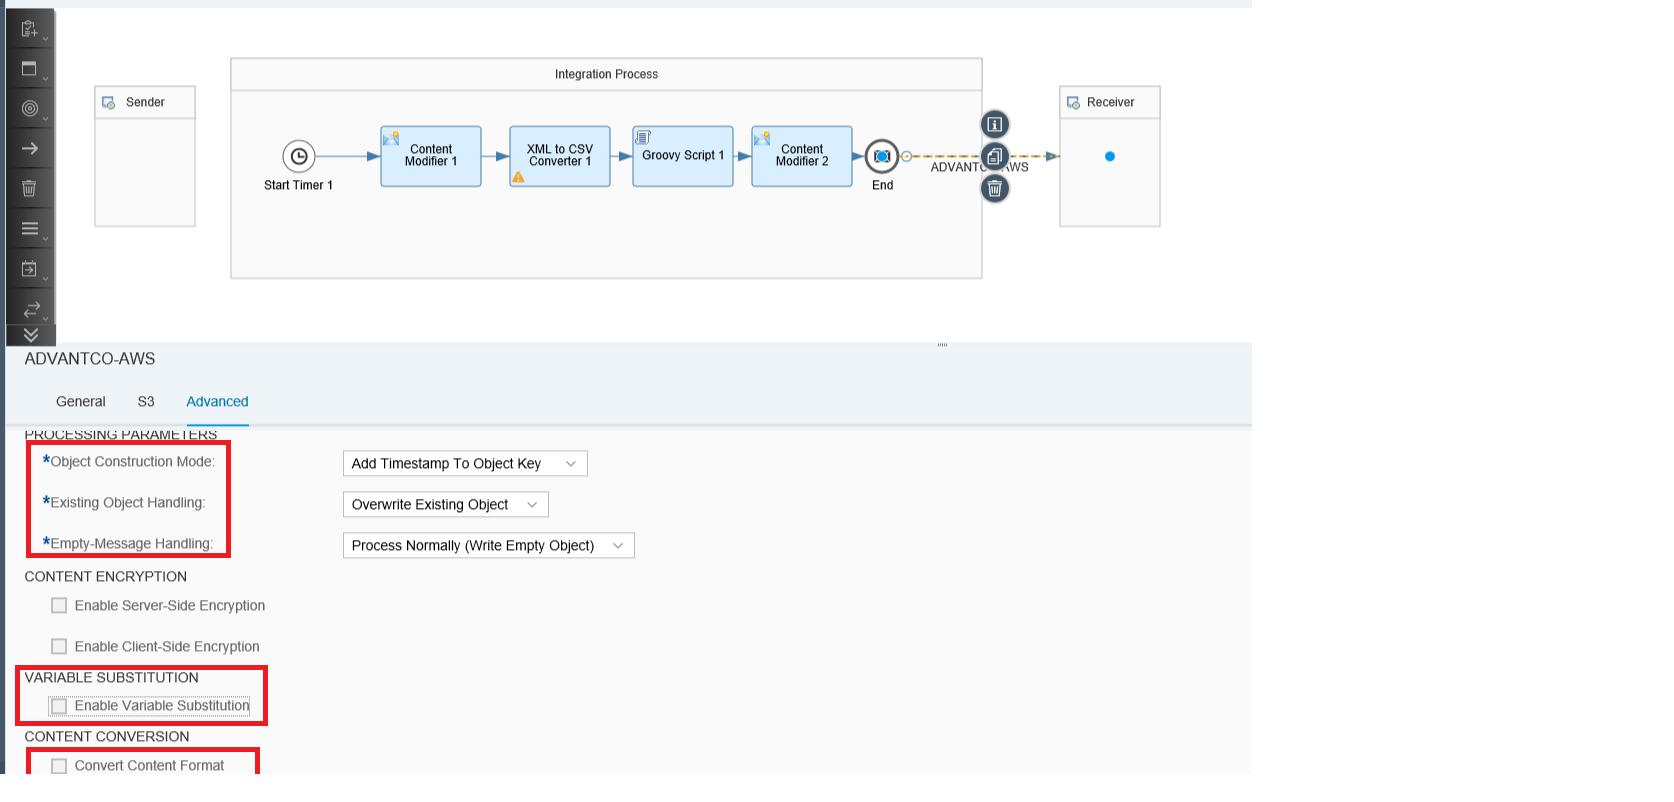 Advantco Adapter-Amazon S3 Integration made simple with SAP CPI